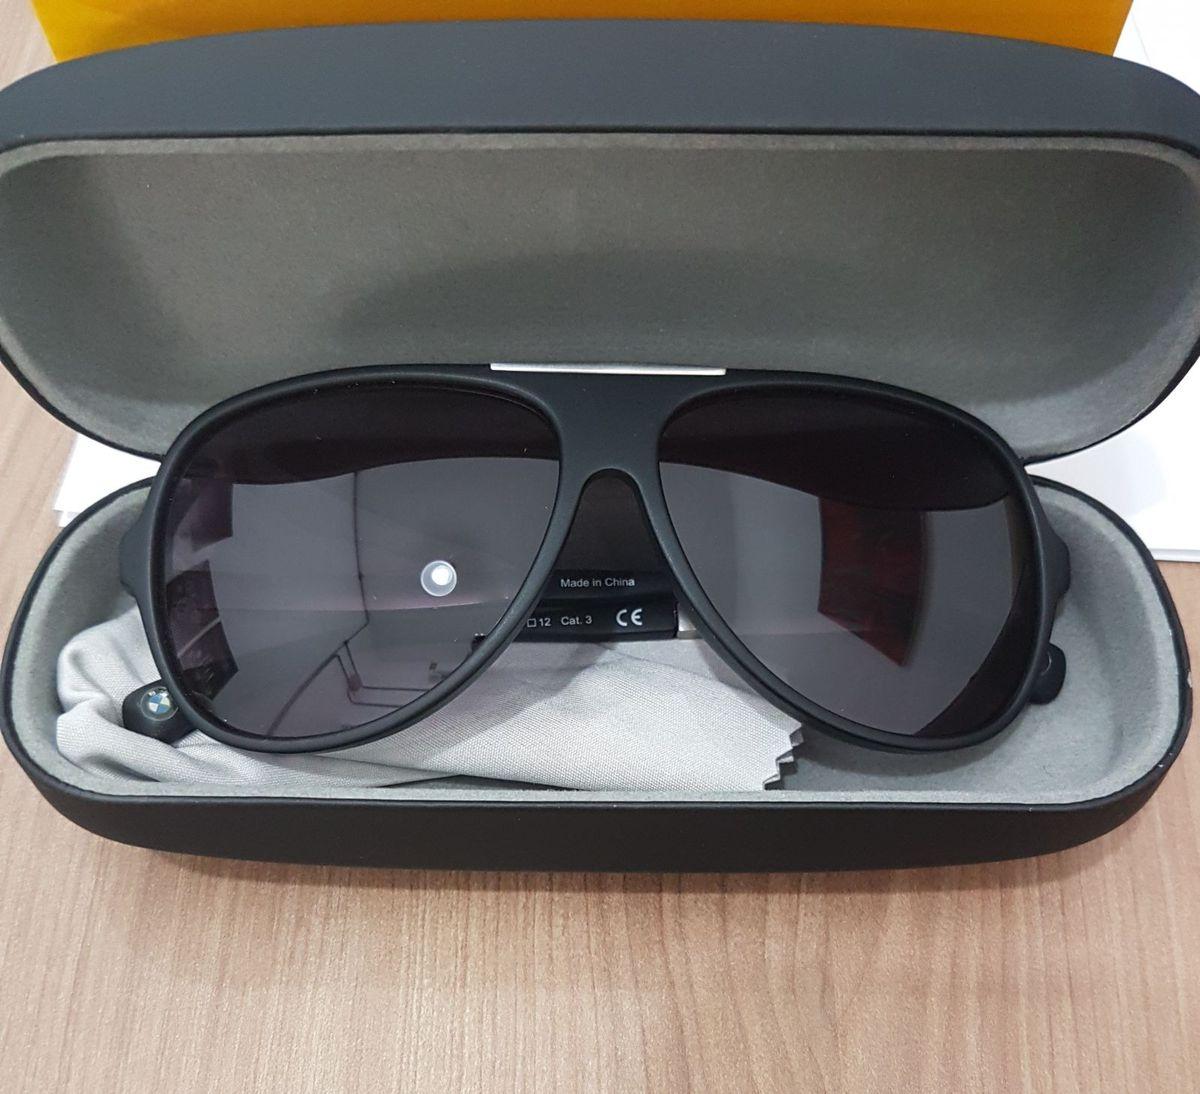 e9f3ca6251c5a óculos de sol bmw original - óculos bmw.  Czm6ly9wag90b3muzw5qb2vplmnvbs5ici9wcm9kdwn0cy83ntg4ntmzl2rjnzaxmdczytqxntbhnmmyodc5ymjlymy5mza4zwy5lmpwzw  ...